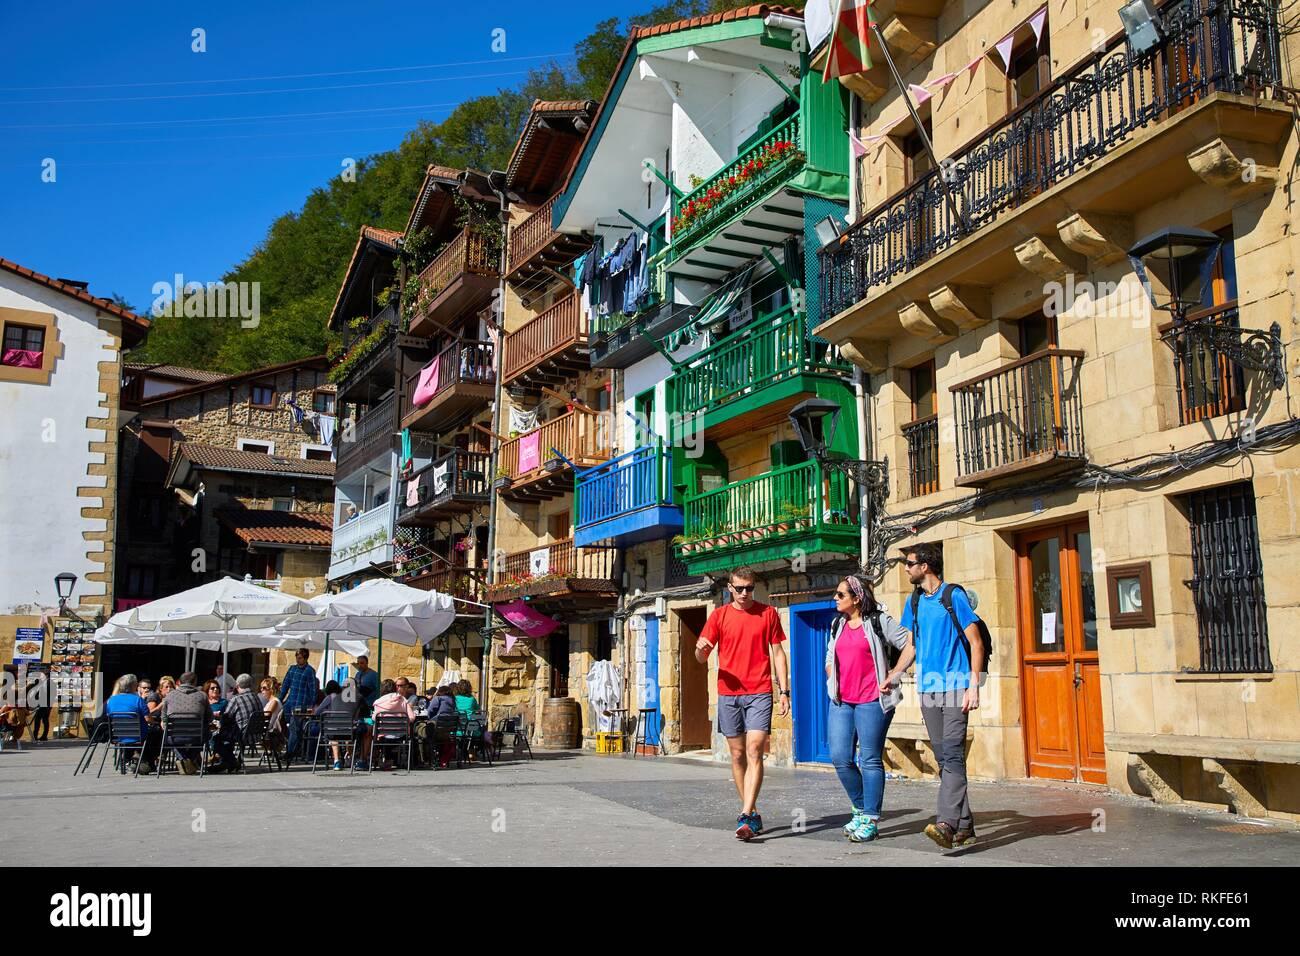 Guide and group of tourists visiting the city, Plaza Santiago, Pasai Donibane, Pasajes de San Juan, Gipuzkoa, Basque Country, Spain, Europe - Stock Image